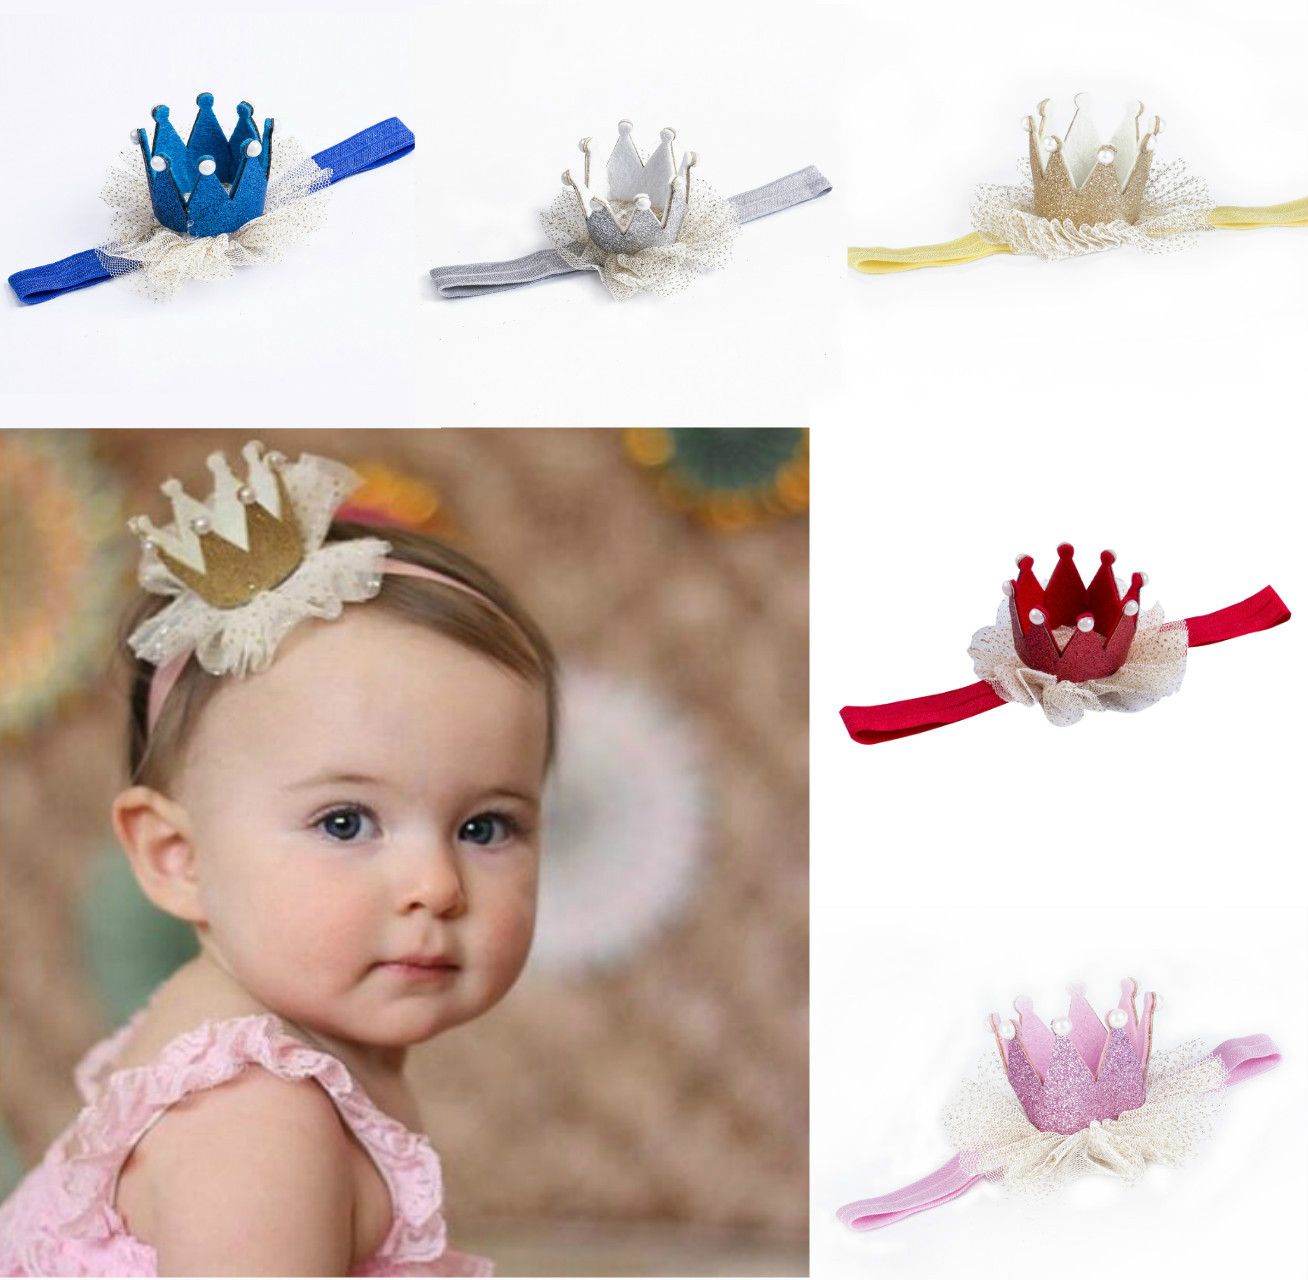 8Pcs Newborn Baby Girl Headband Headwear Elastic Hair Band Headdress Accessories